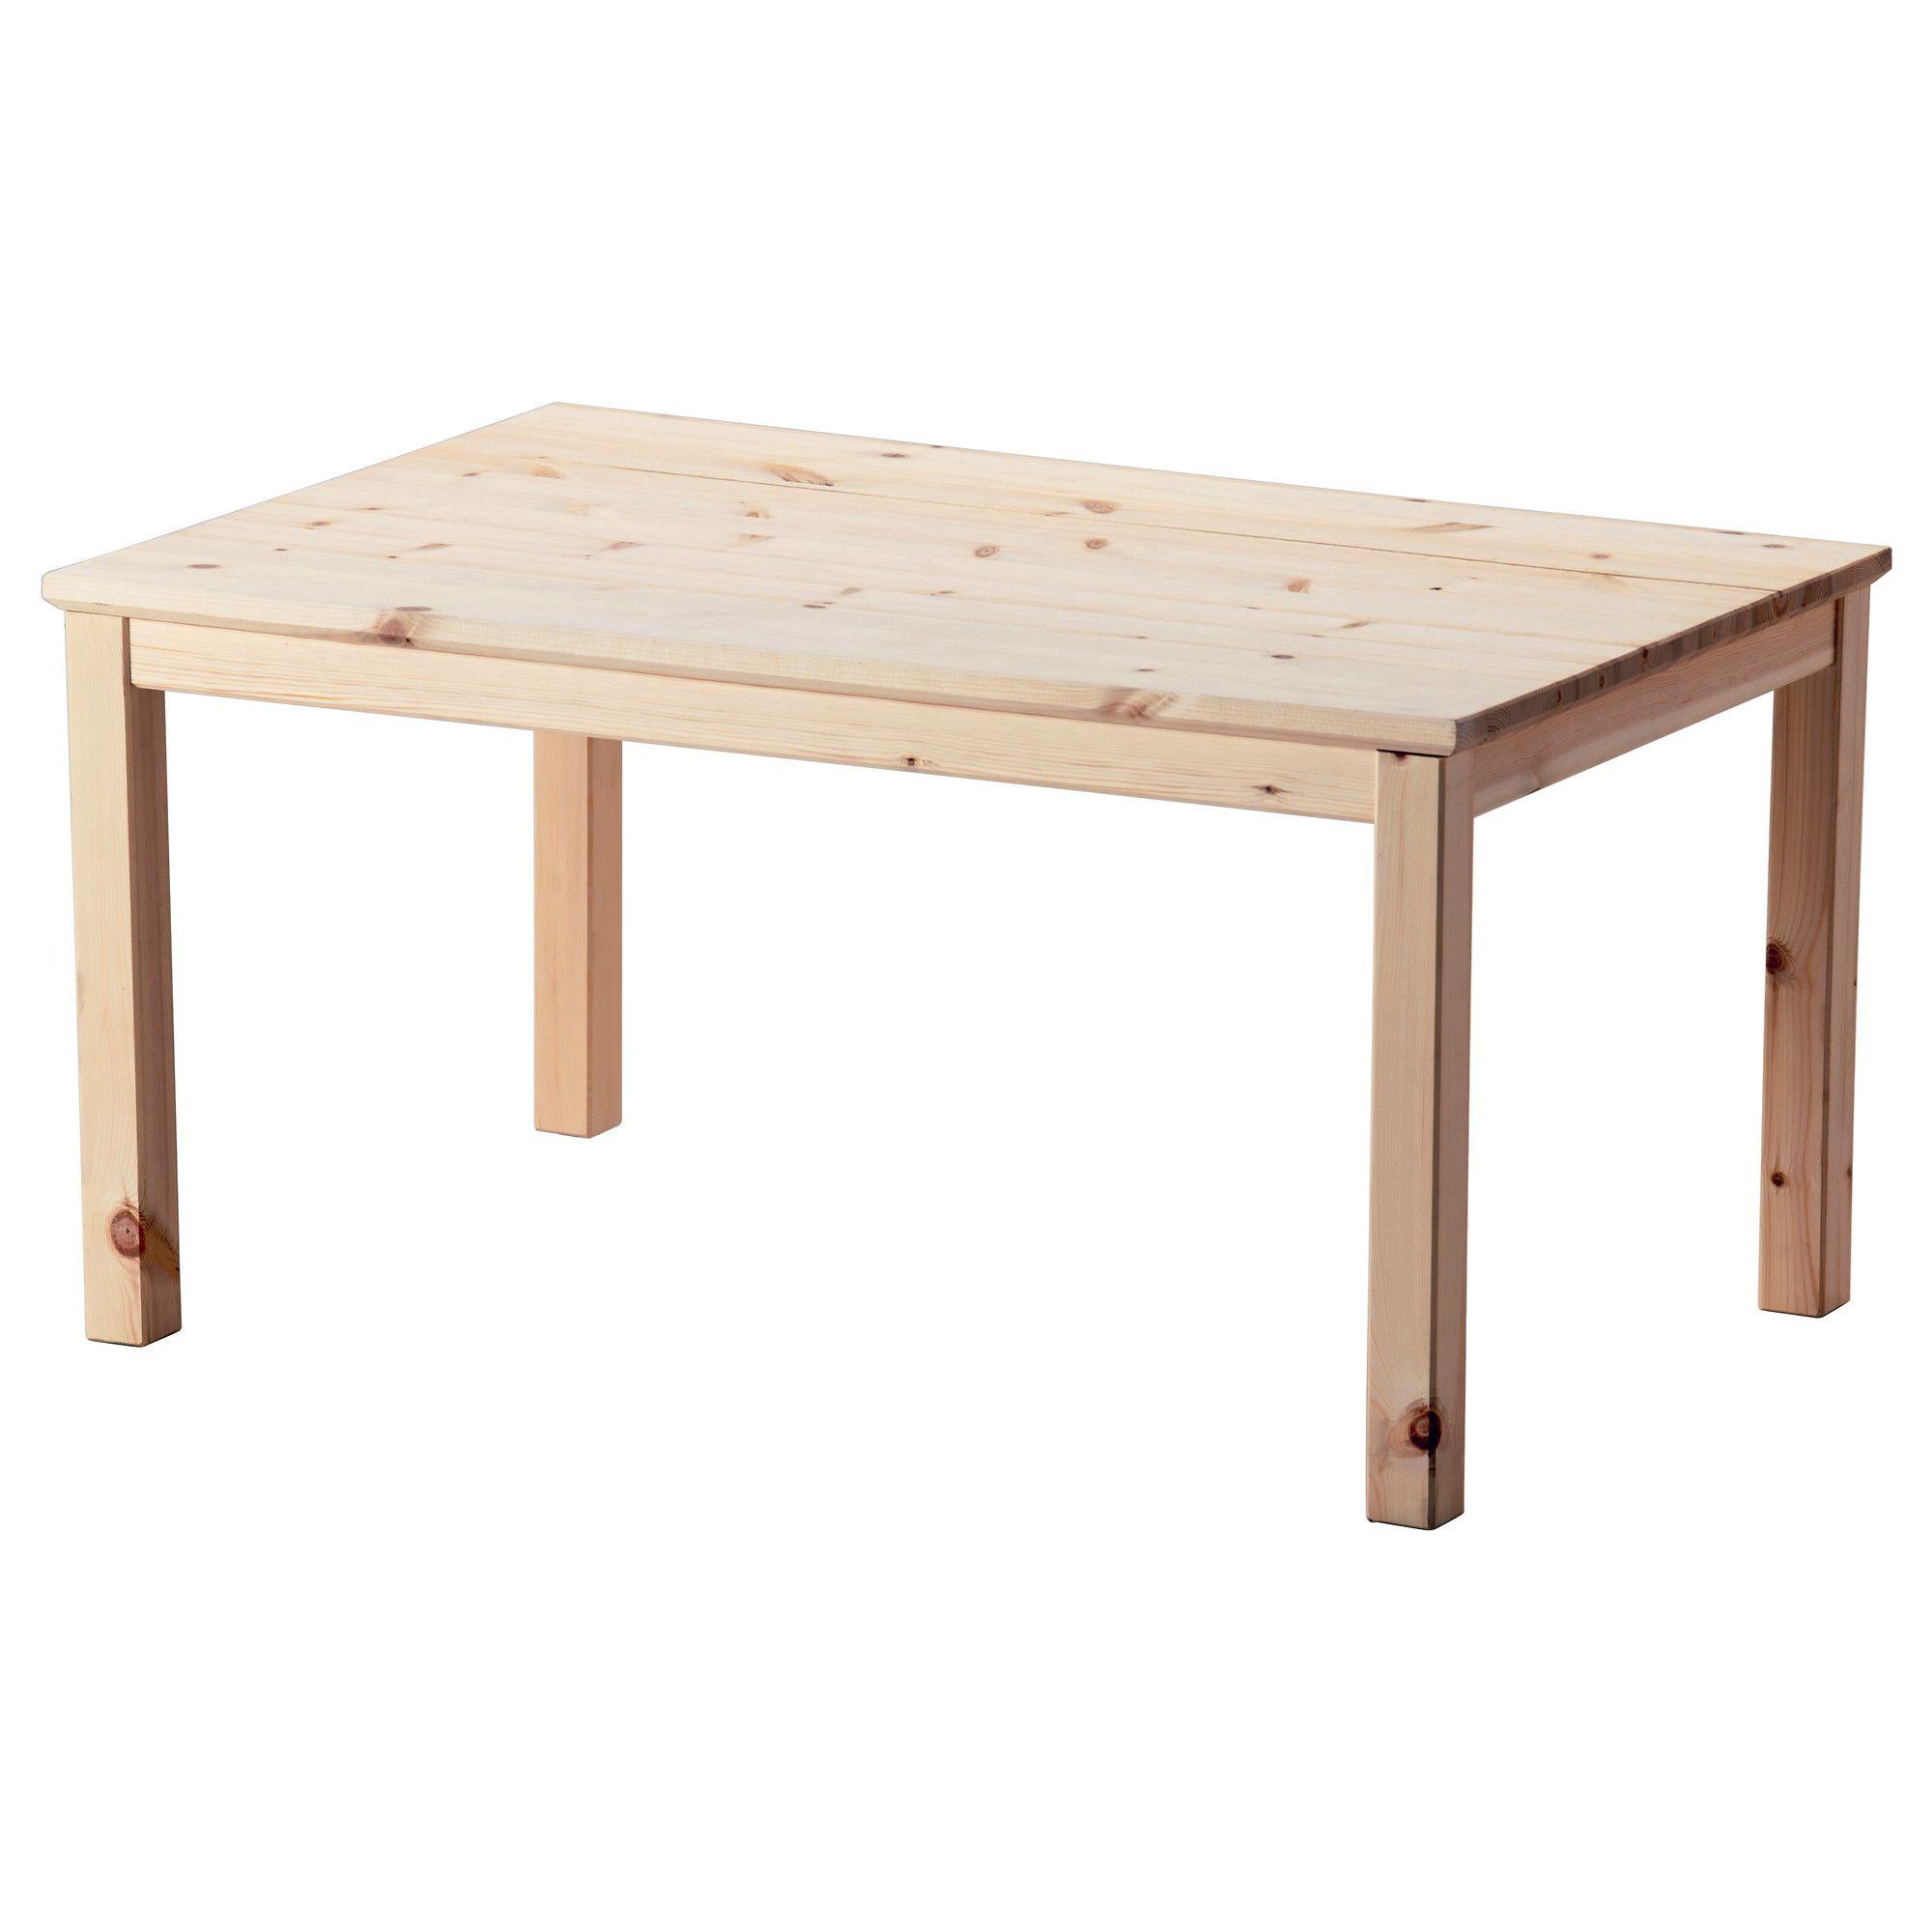 Ikea Mobler Inredning Och Inspiration Ikea Coffee Table Coffee Table Ikea White Coffee Table [ 2000 x 2000 Pixel ]